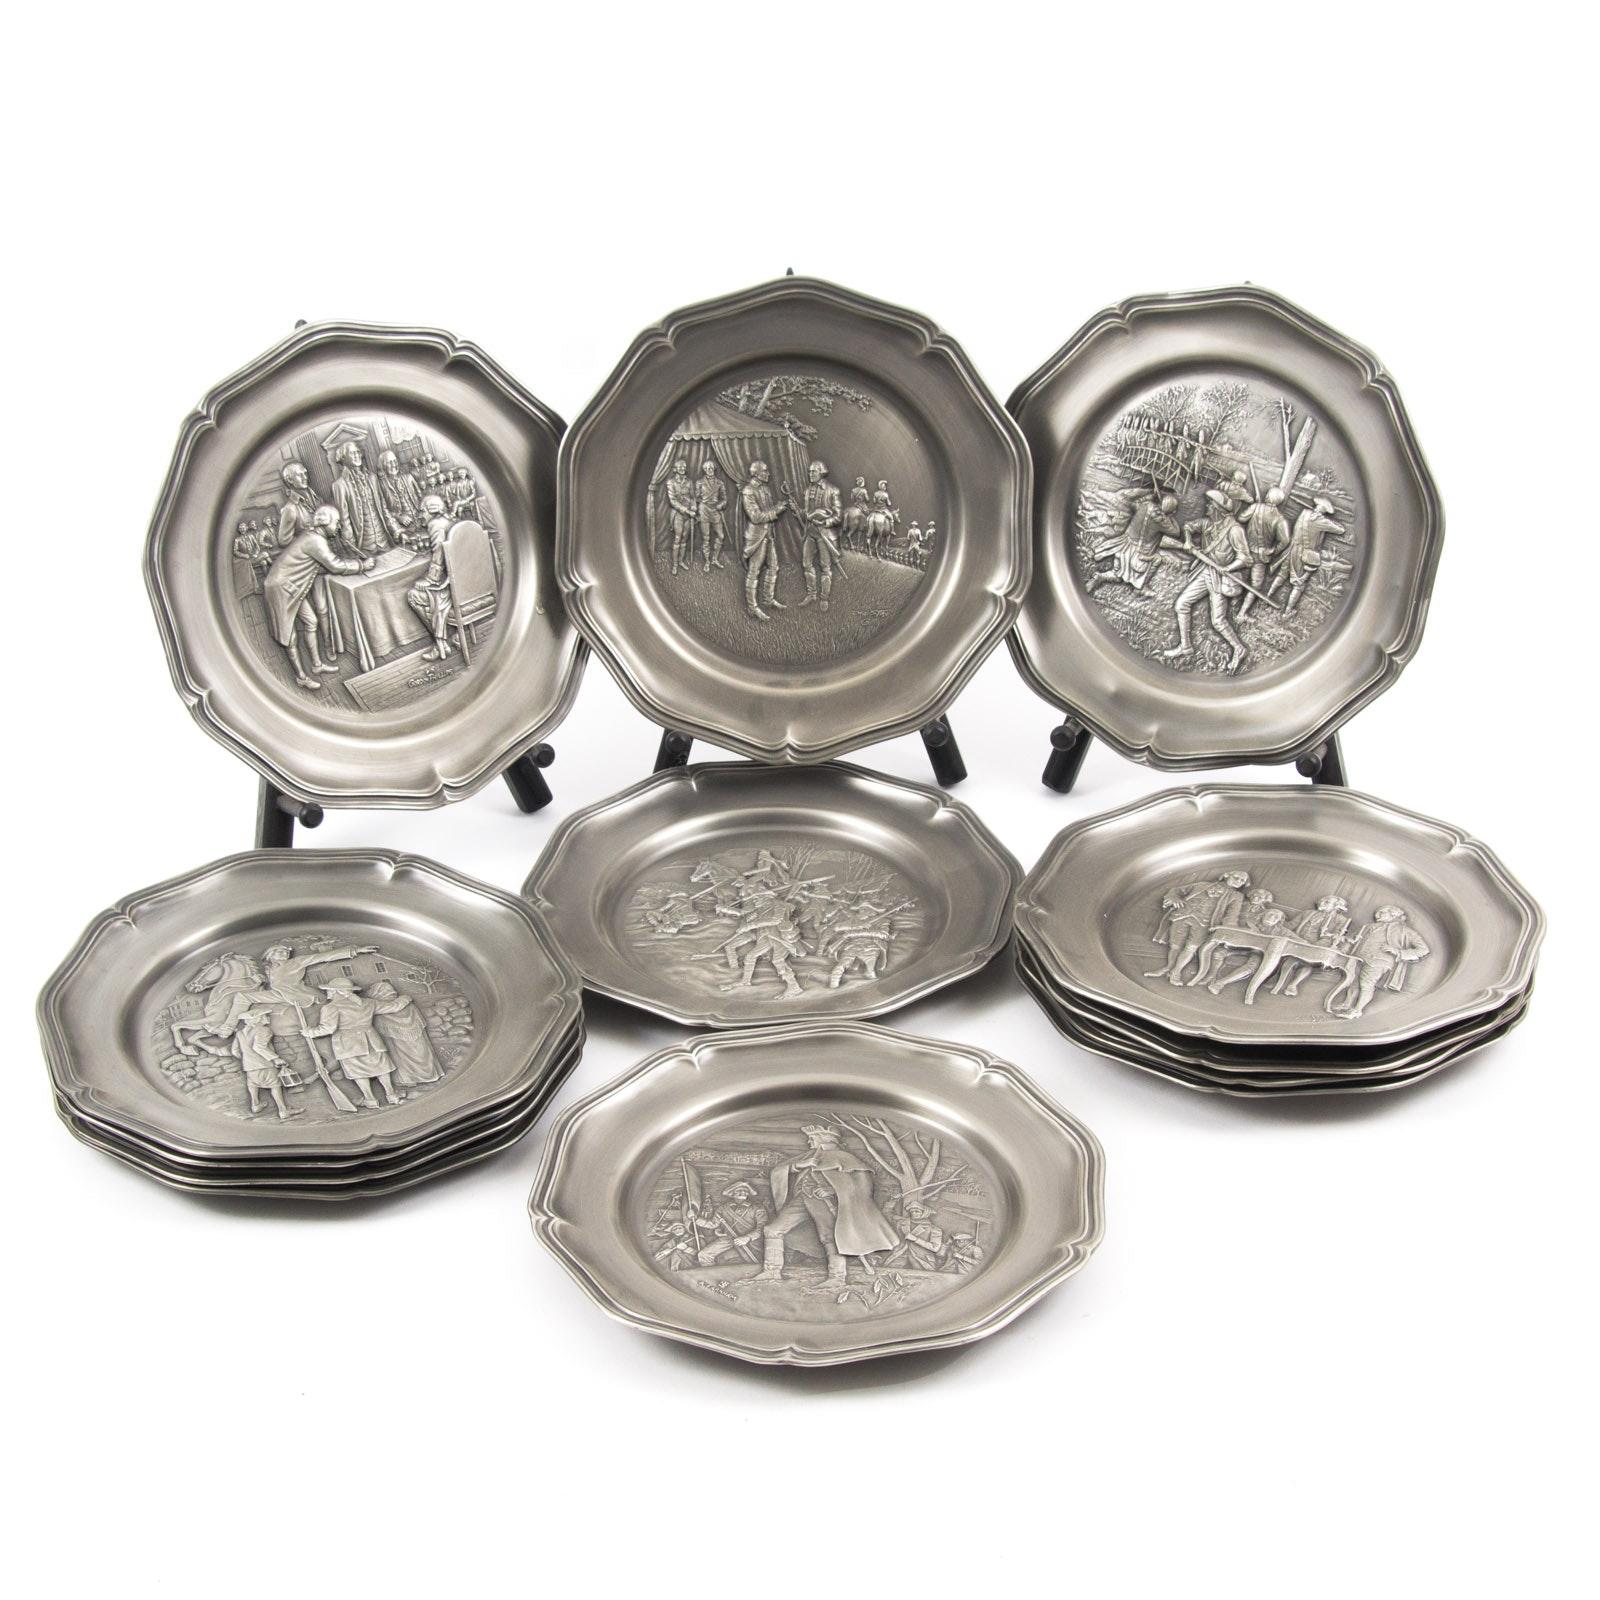 Franklin Mint American Revolution Bicentennial Pewter Plate Set